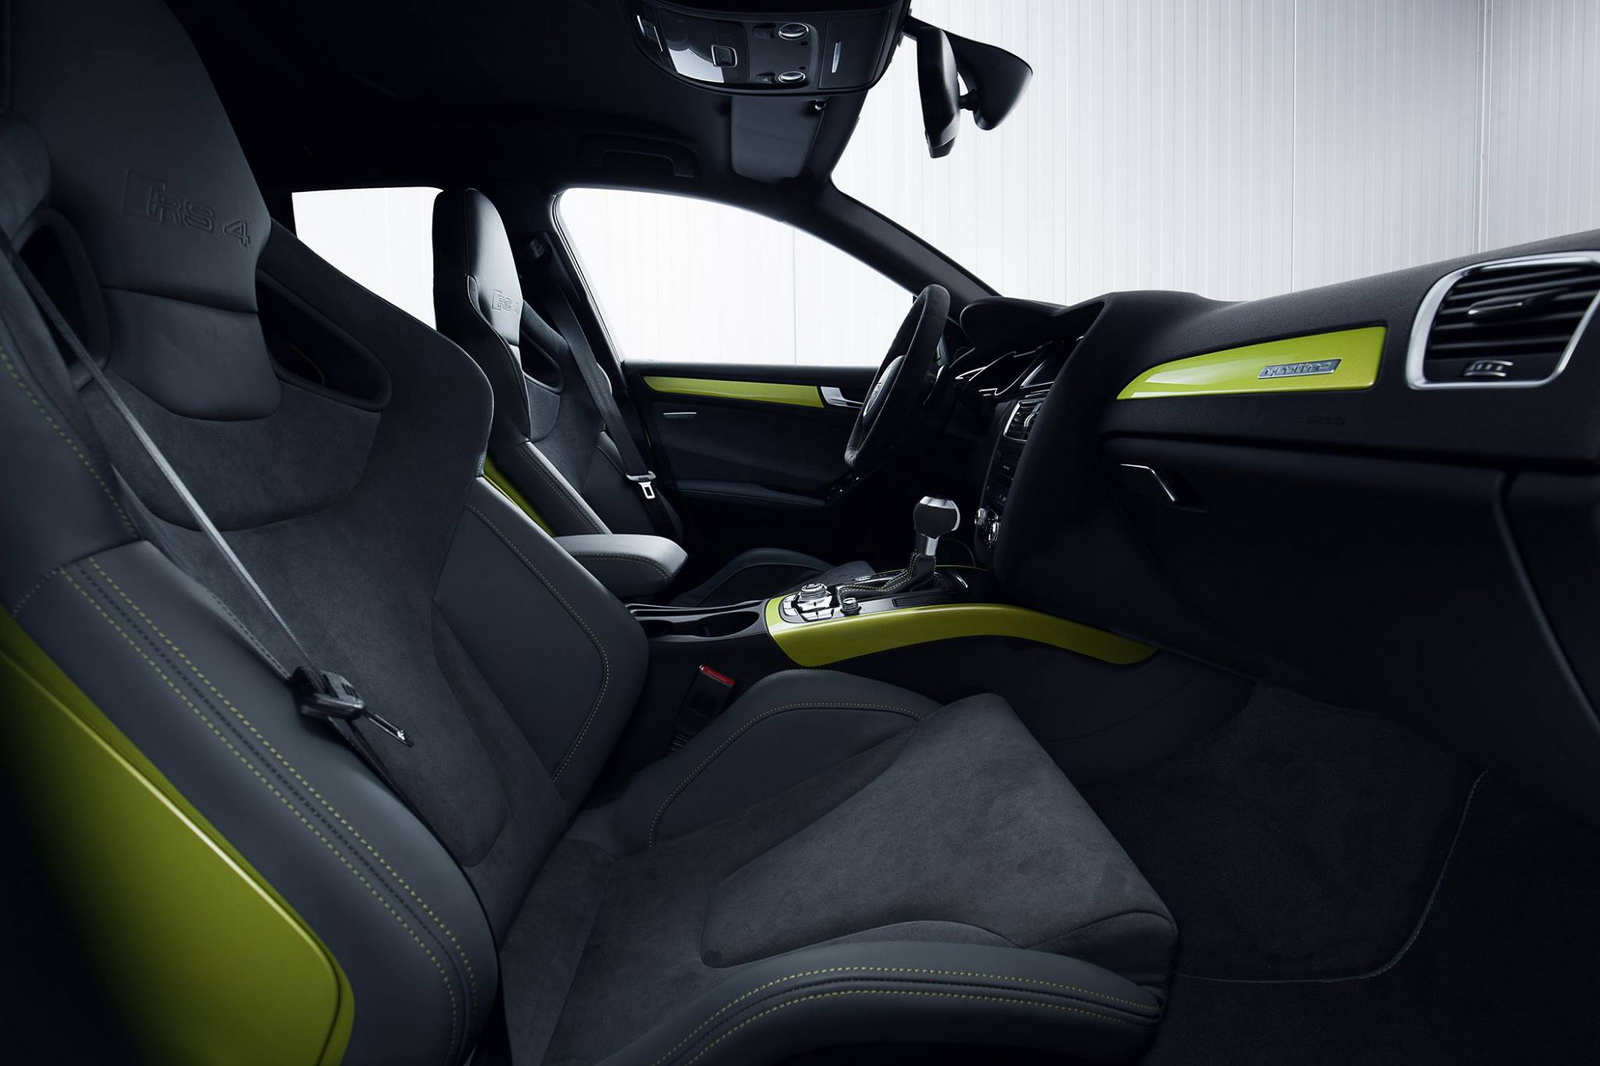 Nội thất bắt mắt của Audi RS4 Avant